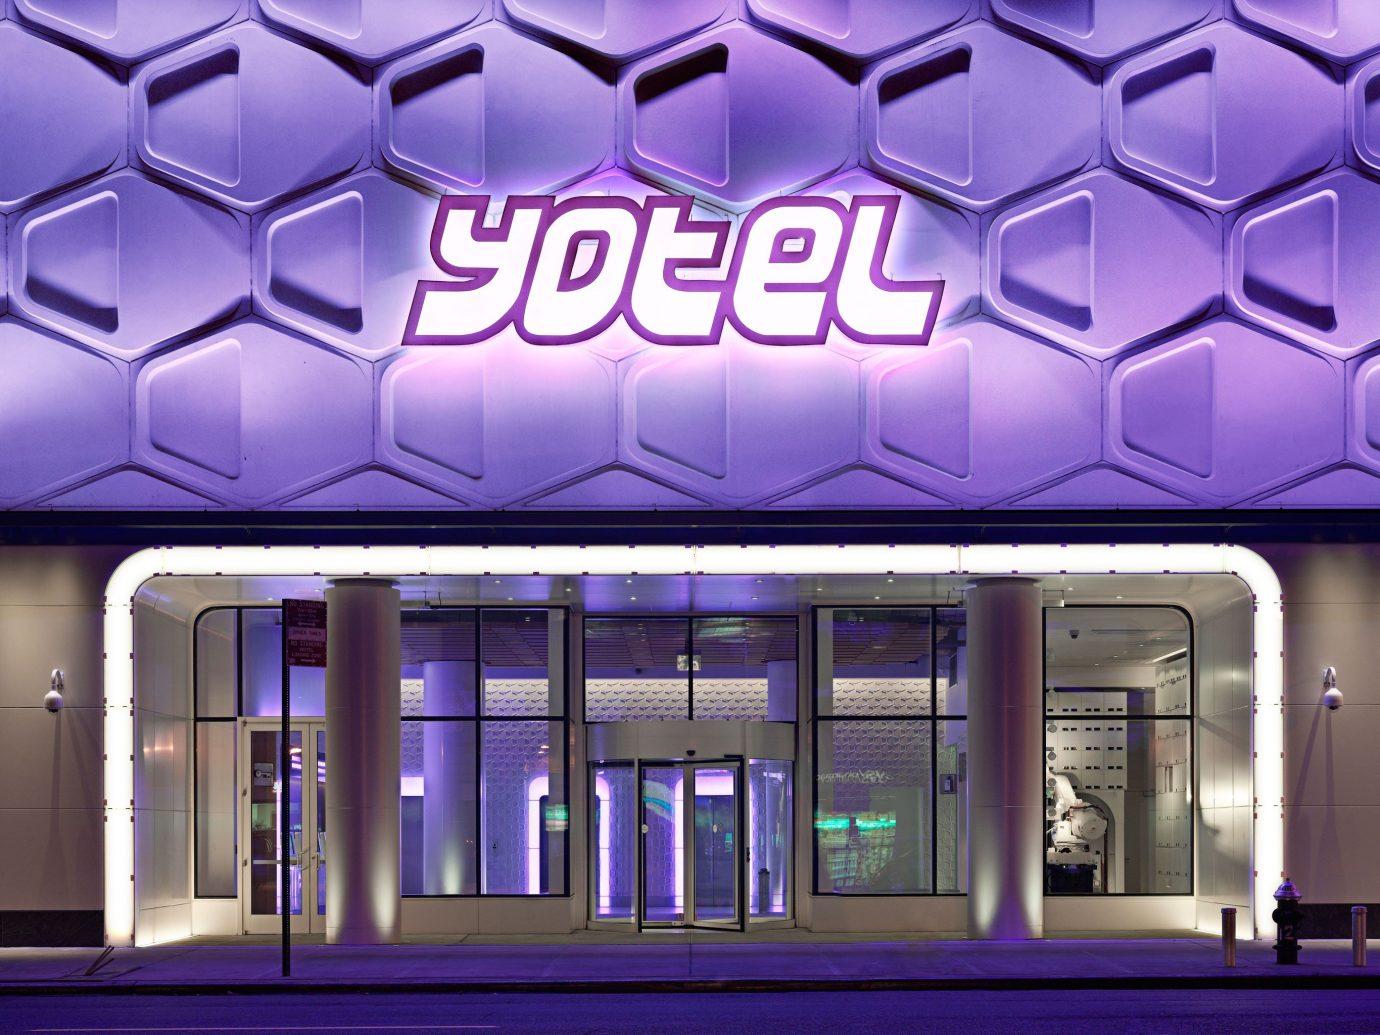 Hotels building facade interior design Design theatre outdoor object signage convention center retail headquarters purple